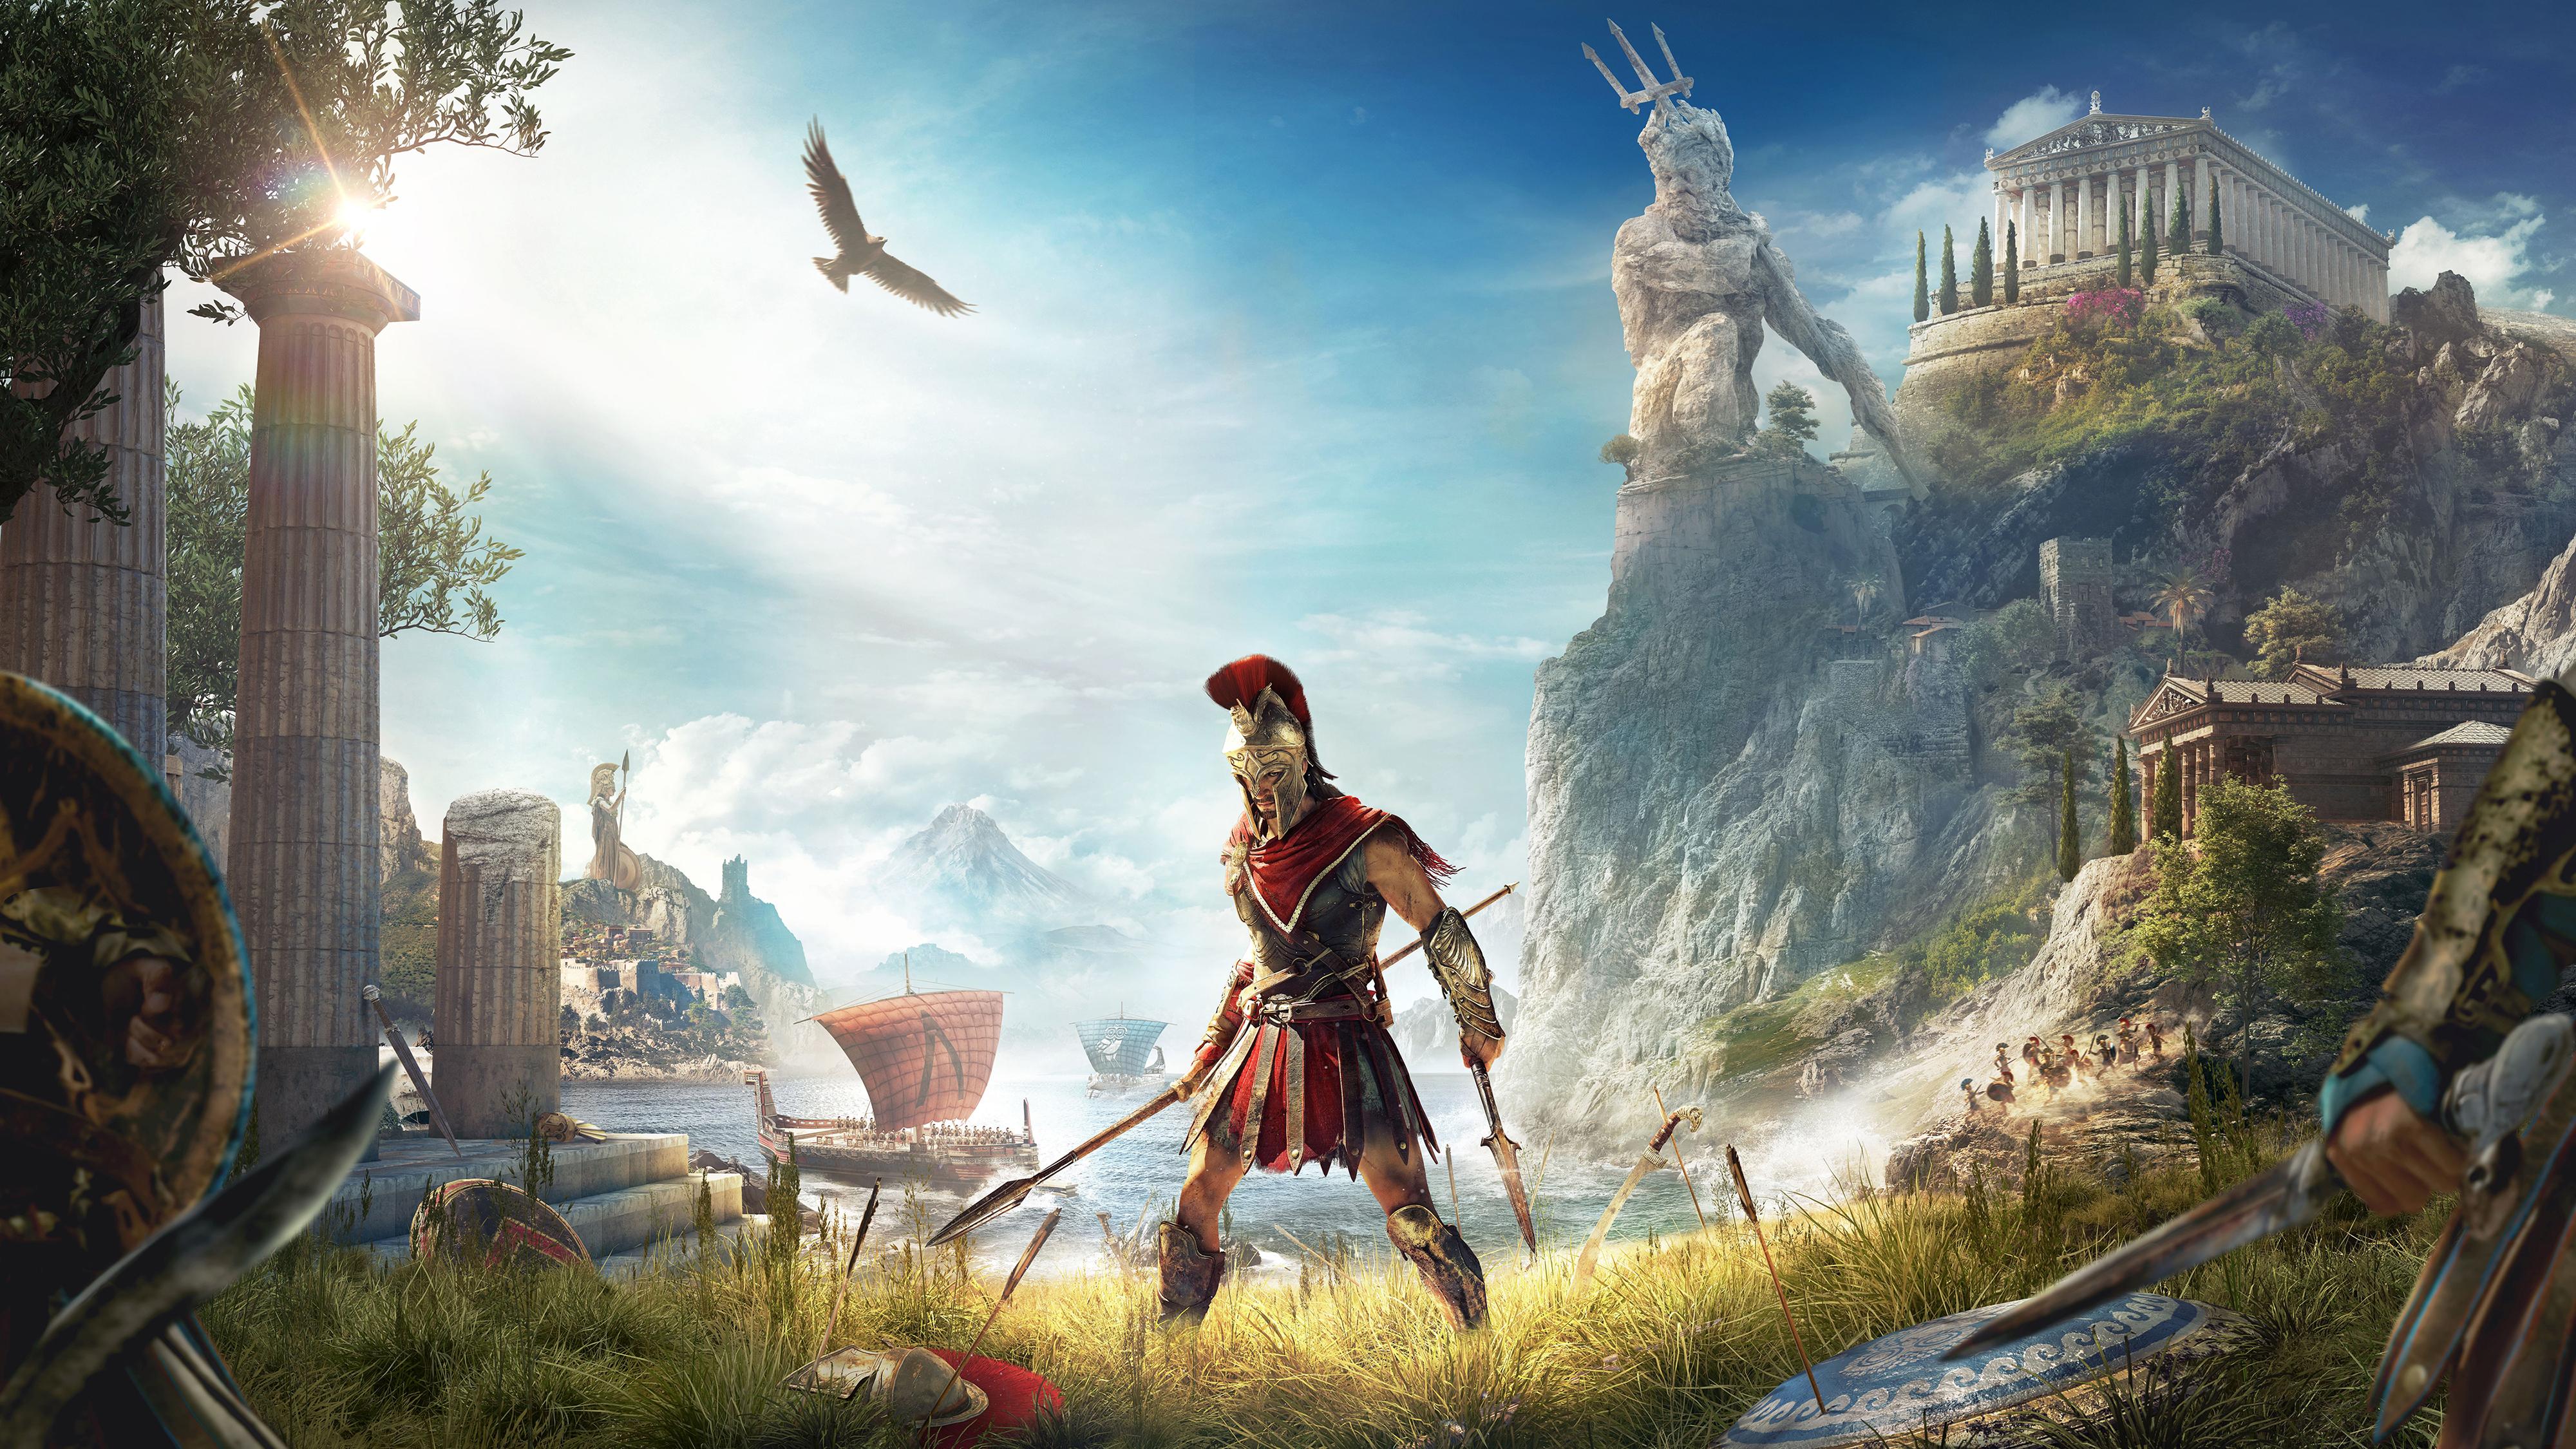 Assassins Creed Odyssey Key Visual